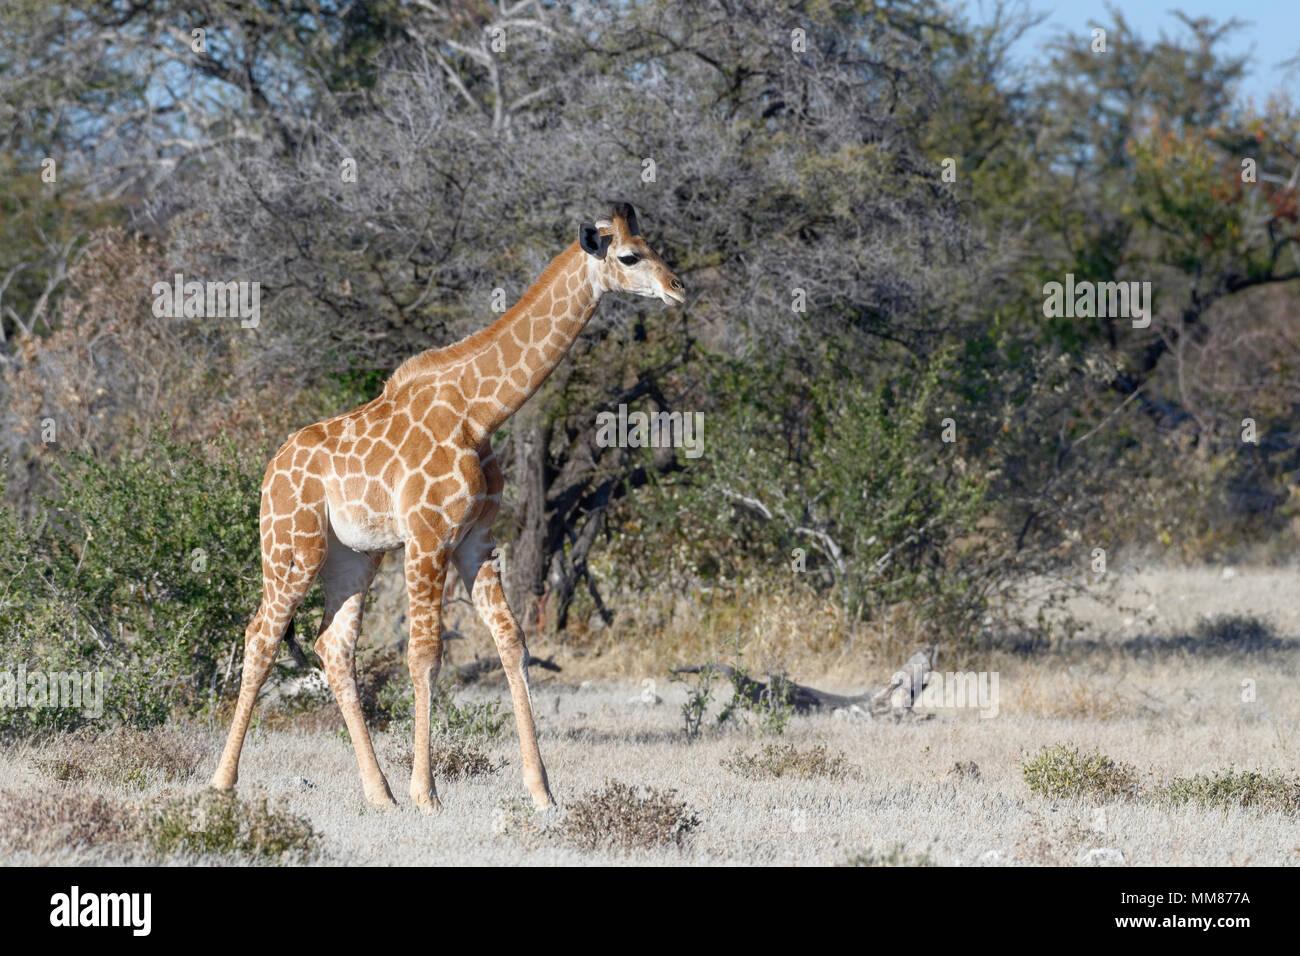 Namibian giraffe or Angolan giraffe (Giraffa camelopardalis angolensis), young animal standing, motionless, Etosha National Park, Namibia, Africa - Stock Image